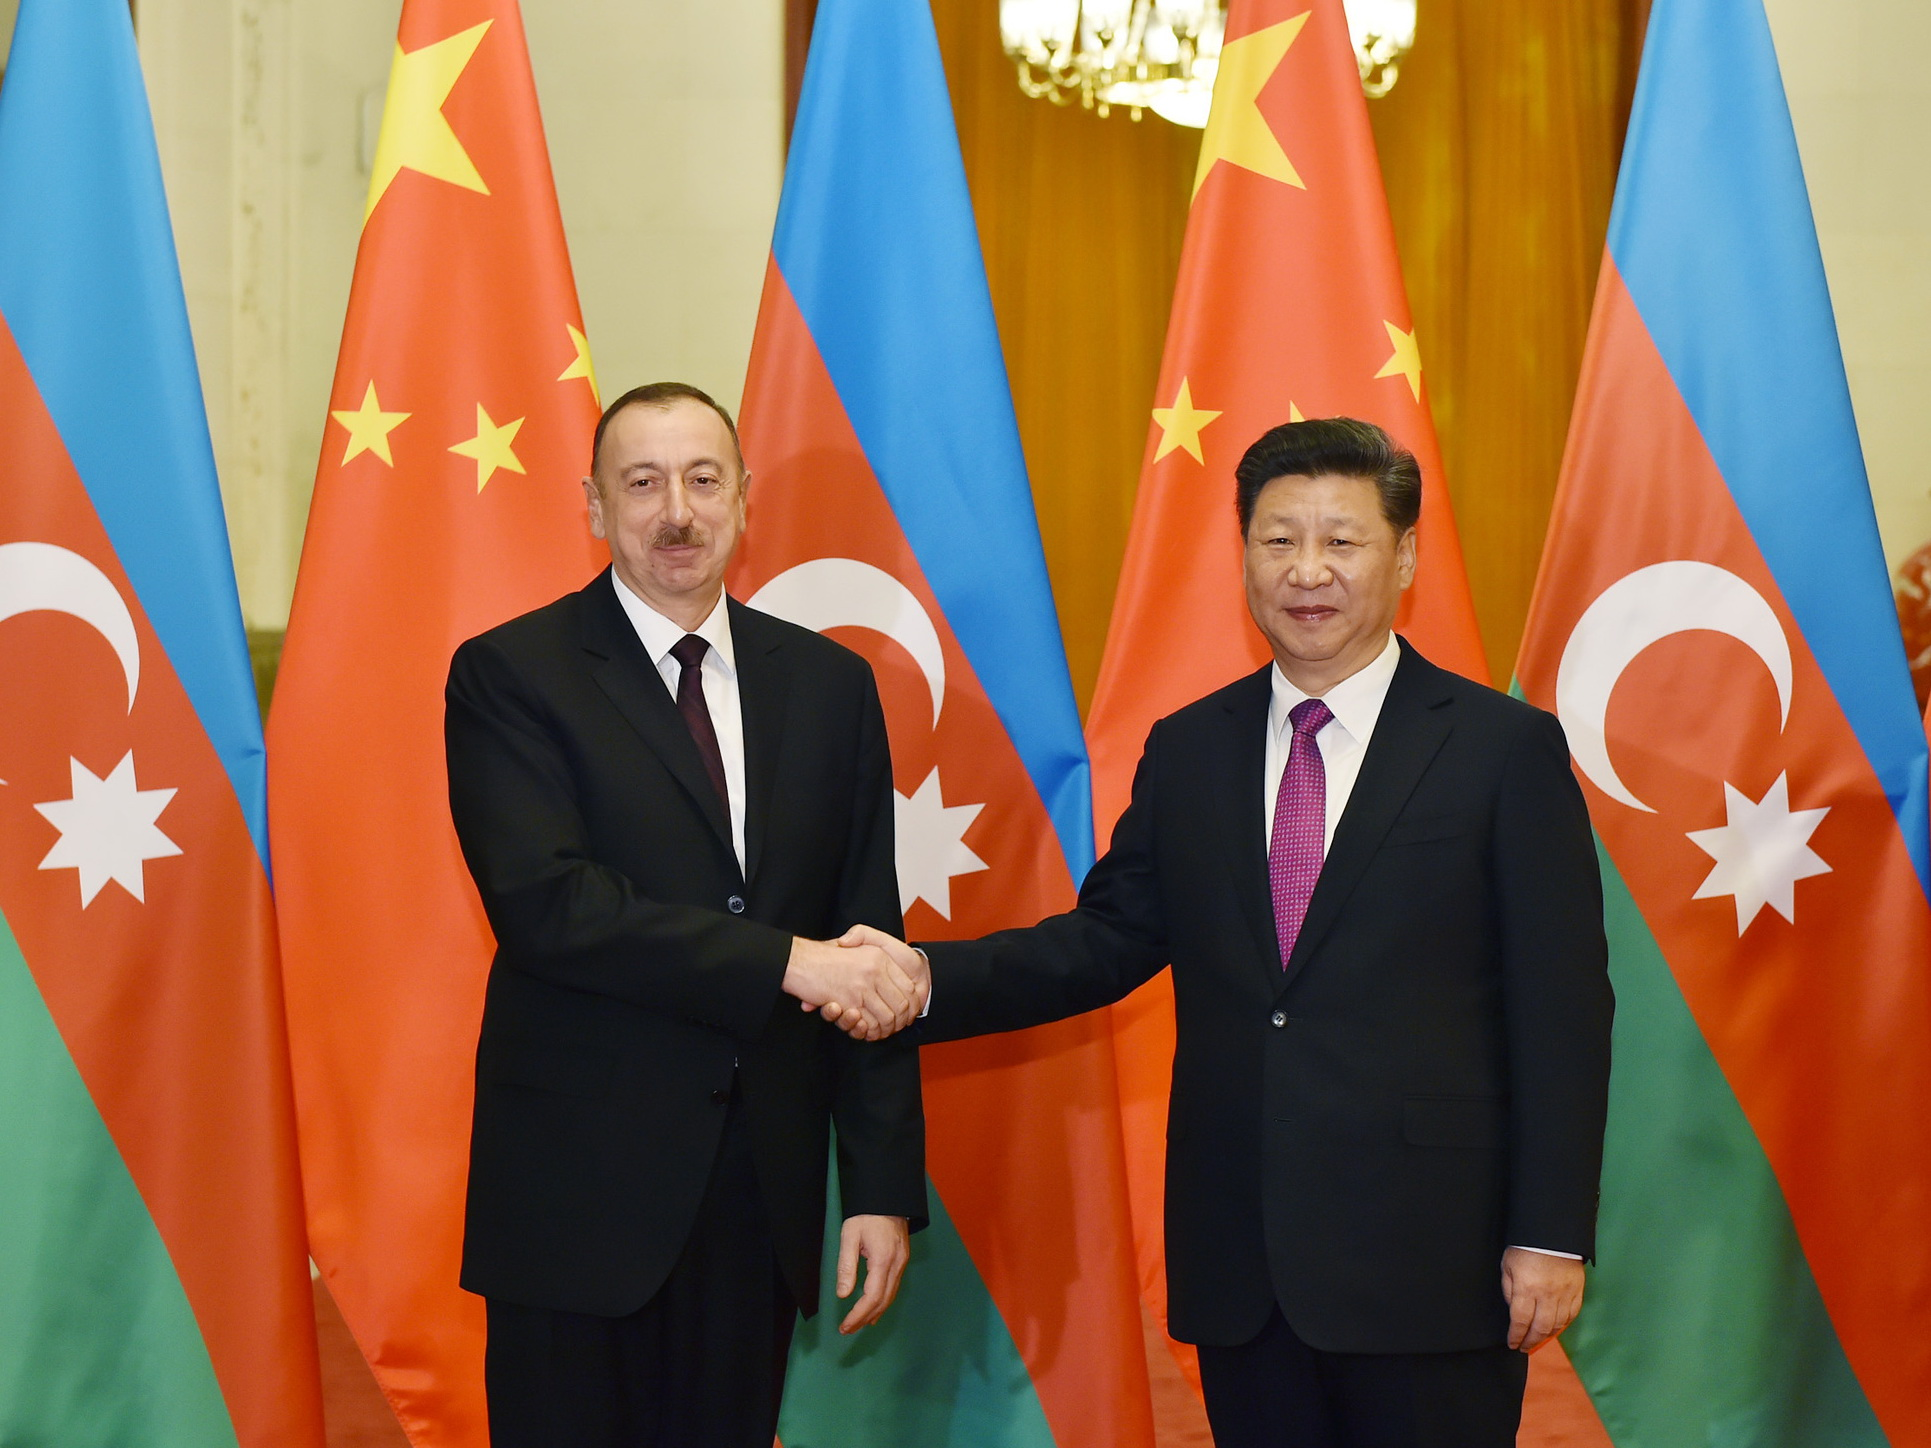 Председатель КНР Си Цзиньпин поздравил Президента Азербайджана